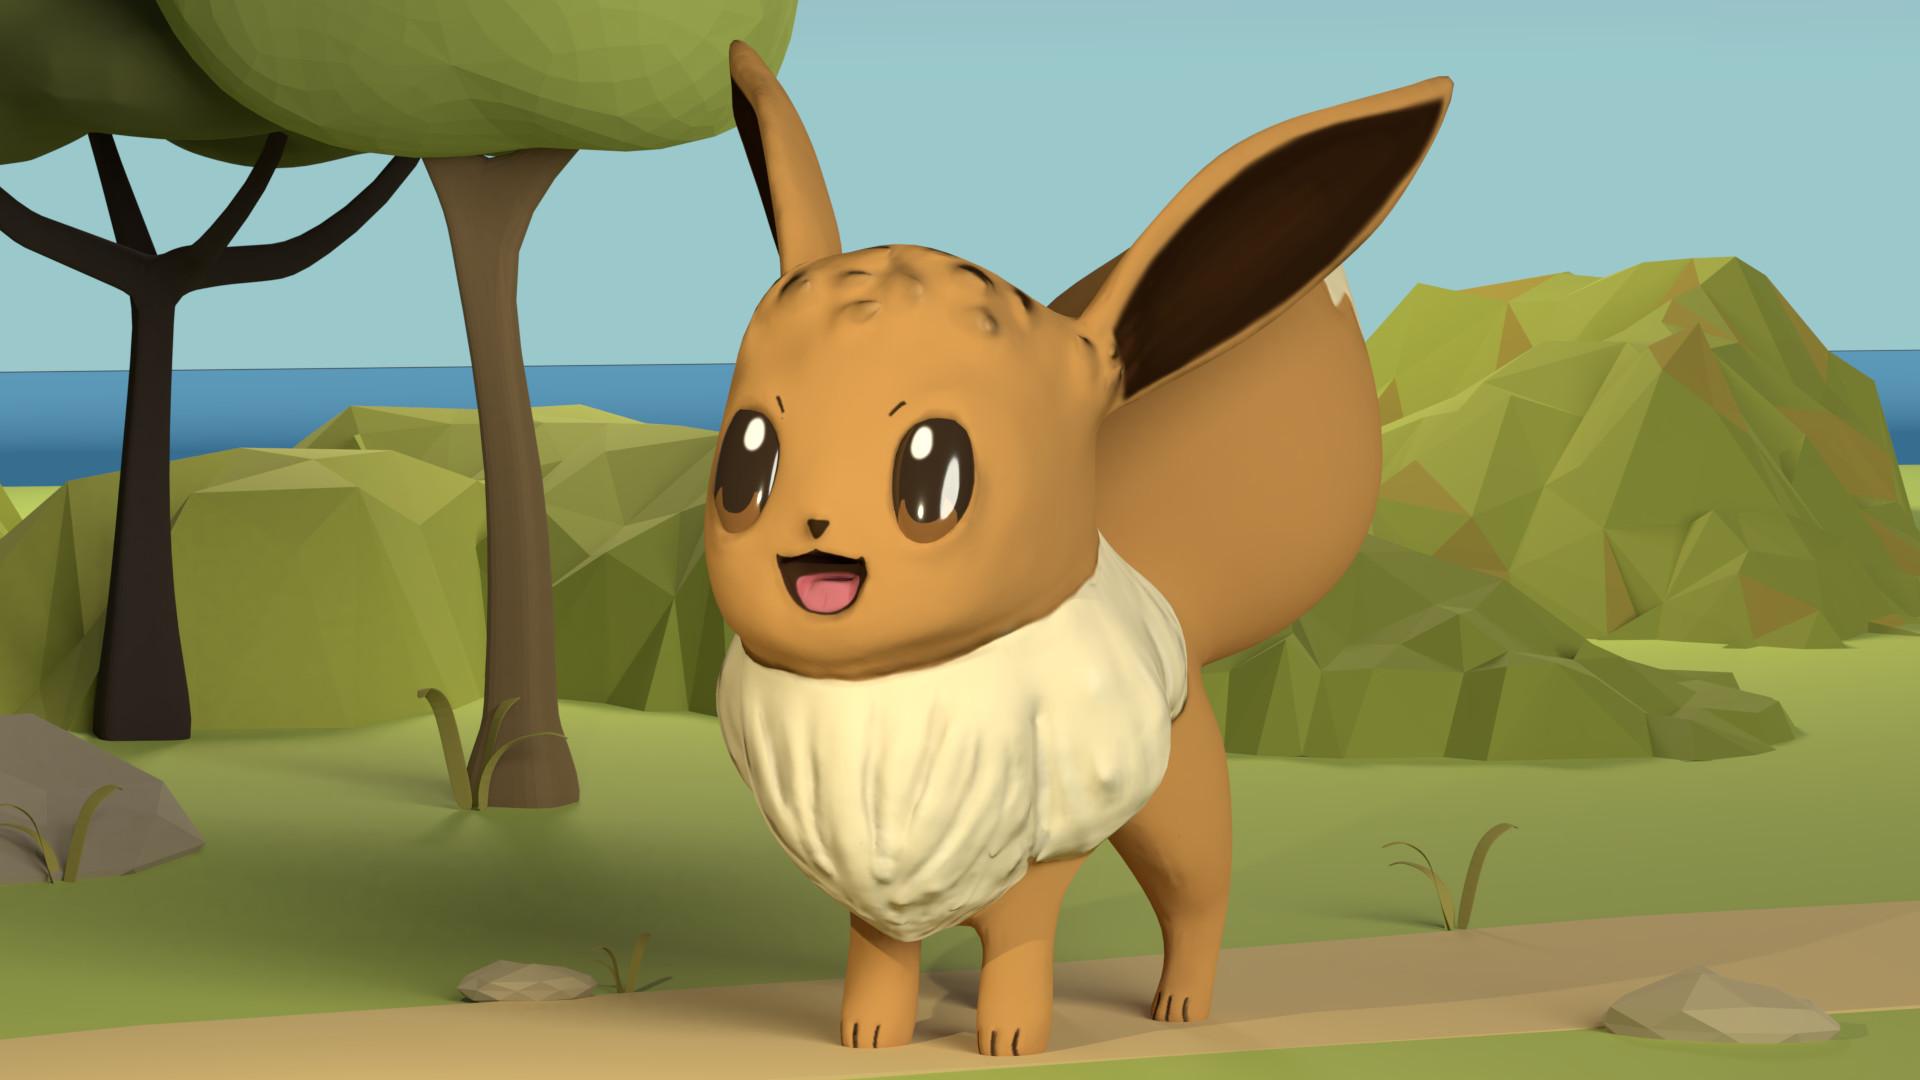 ArtStation - Pokemon 06: Eevee, Katerina Novakova